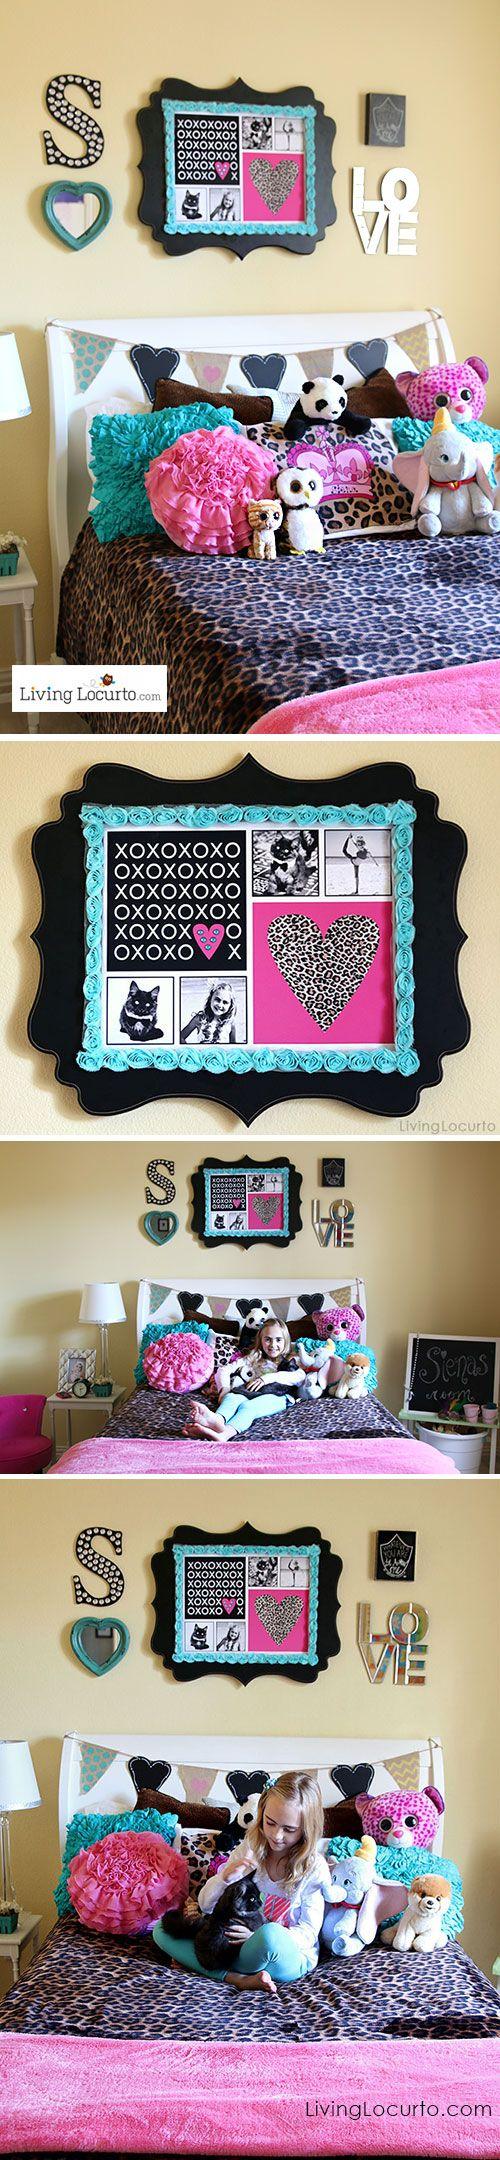 Girls Bedroom Wall Art Ideas Decorating ideas and cute DIY